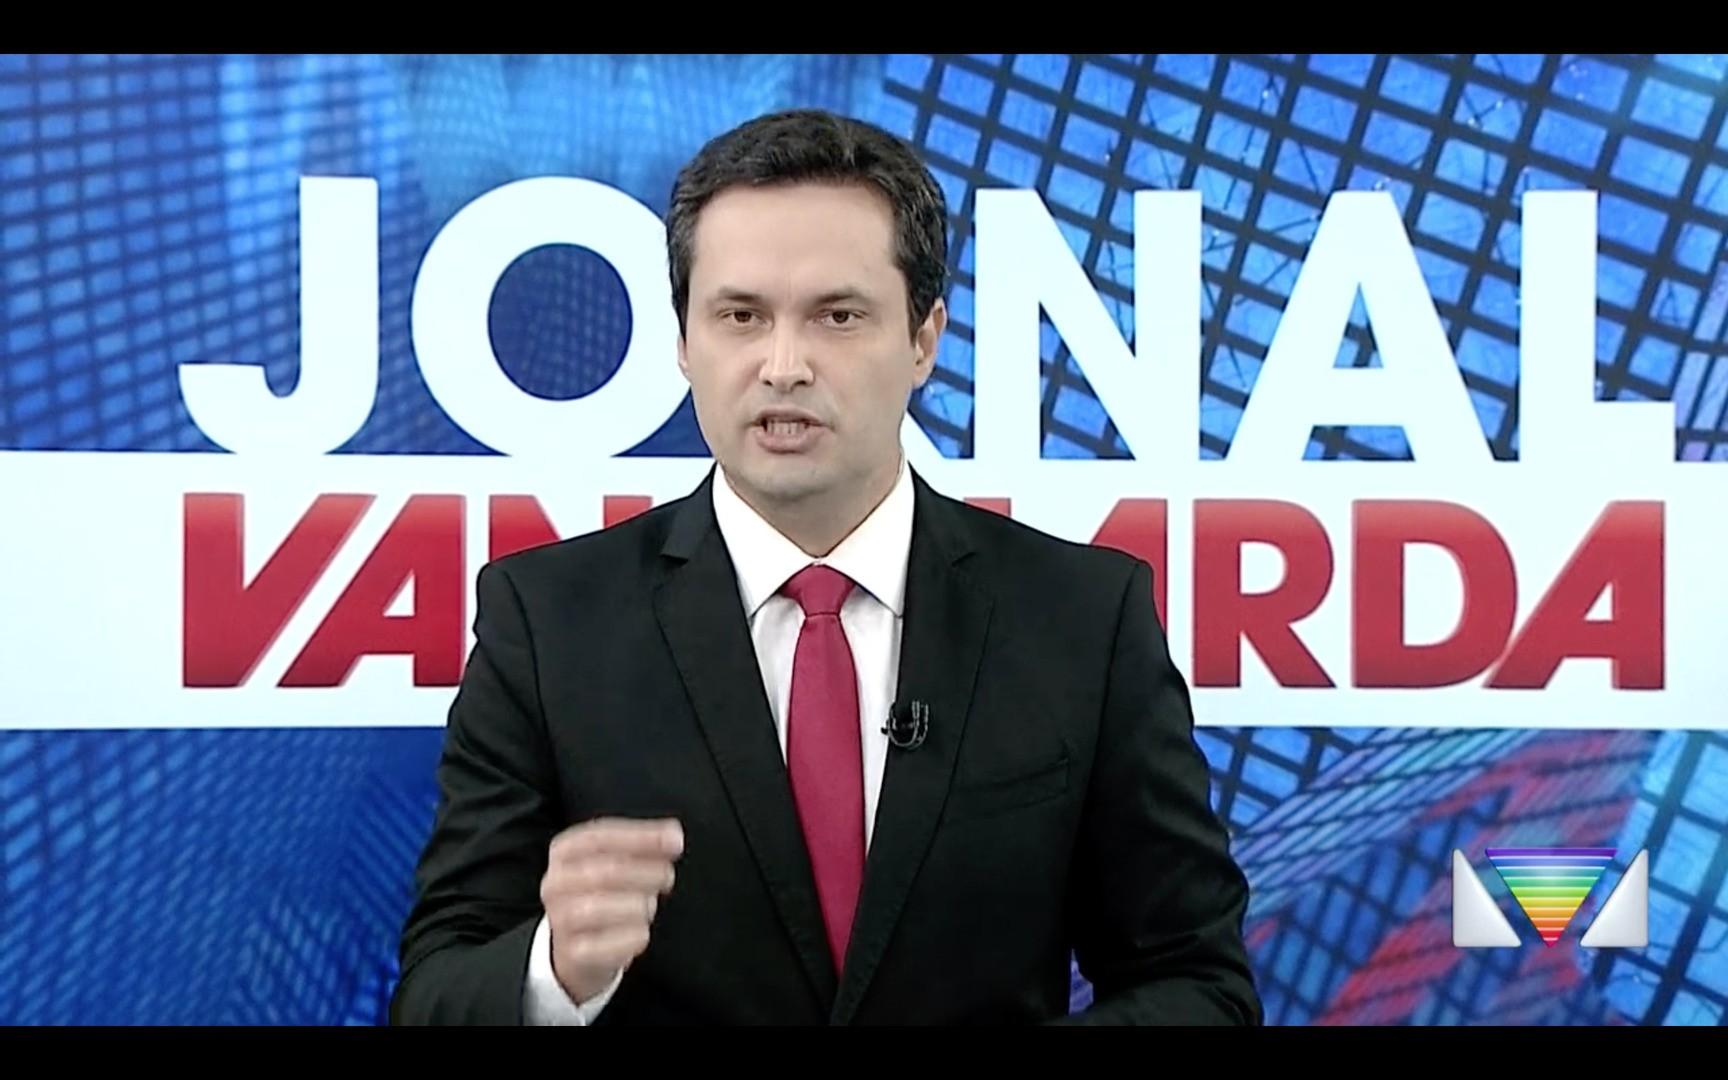 VÍDEOS: Jornal Vanguarda desexta-feira, 15 de janeiro